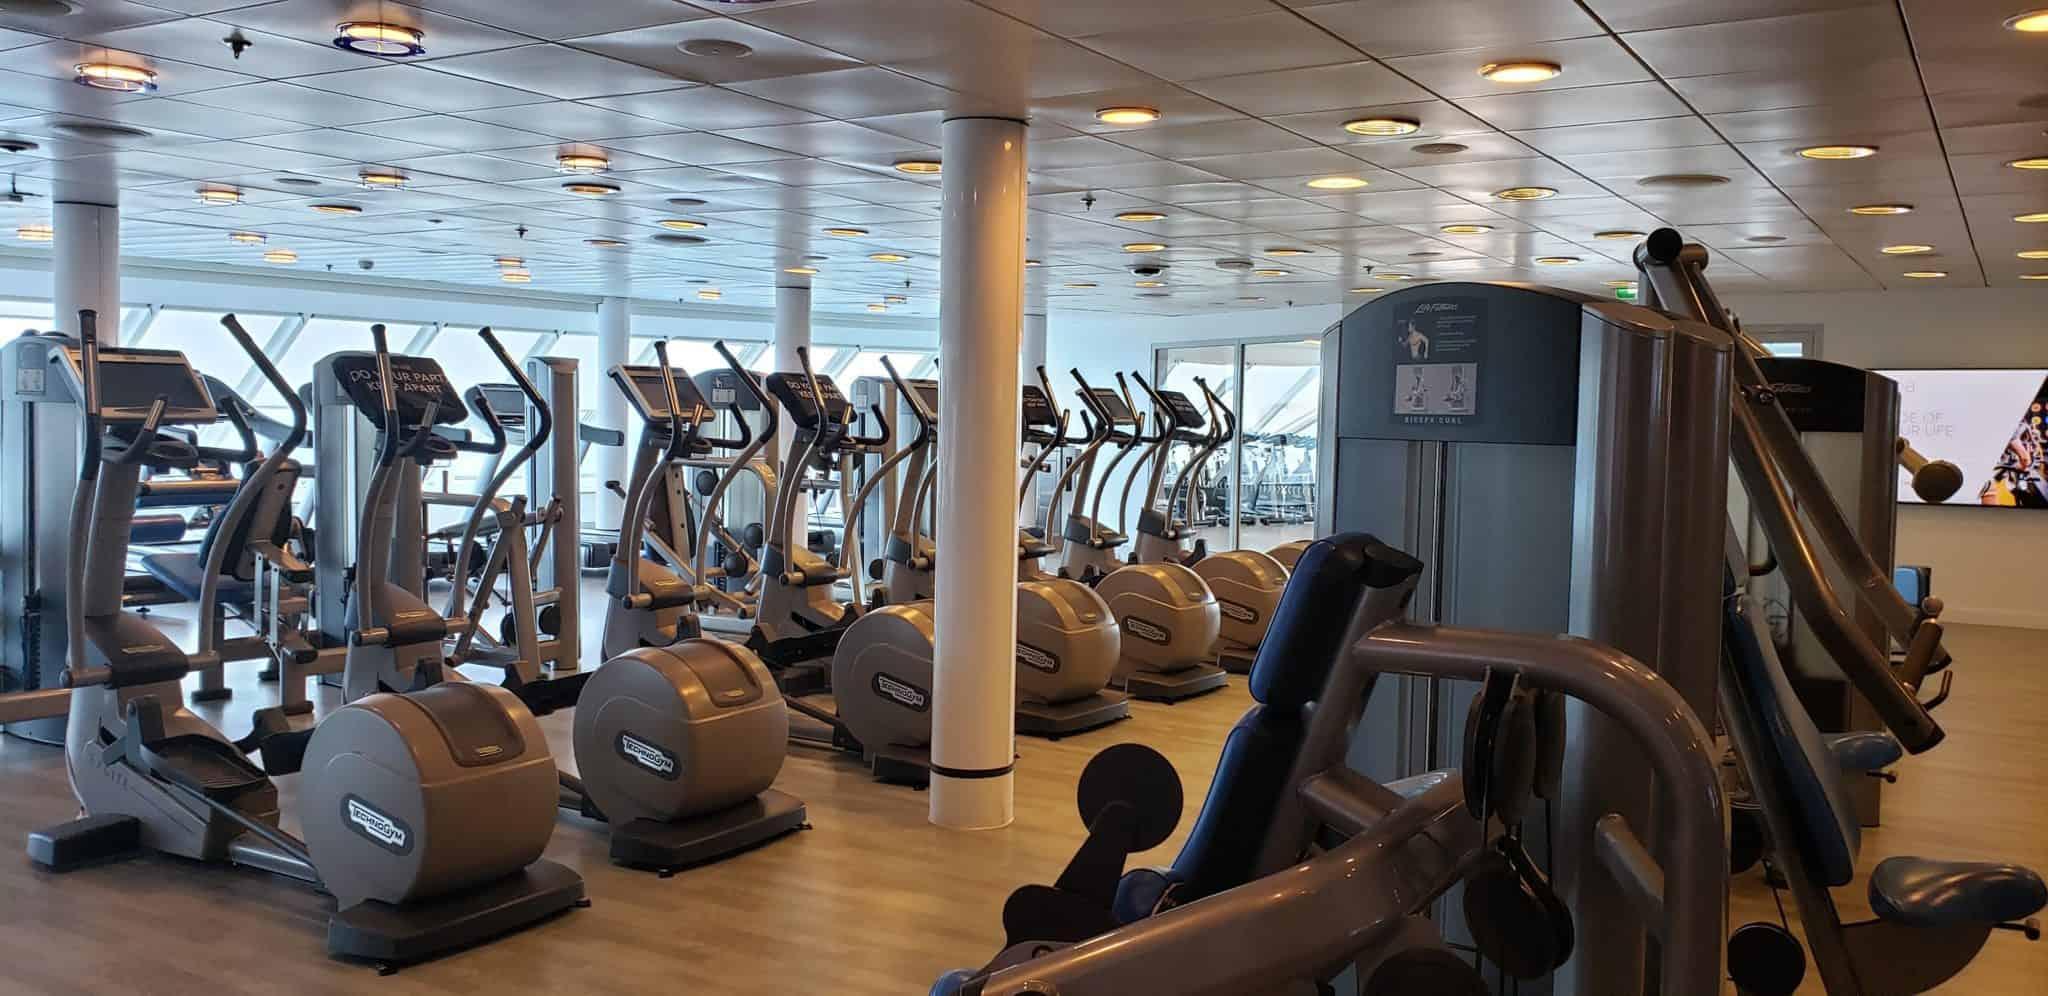 celebrity millennium fitness center